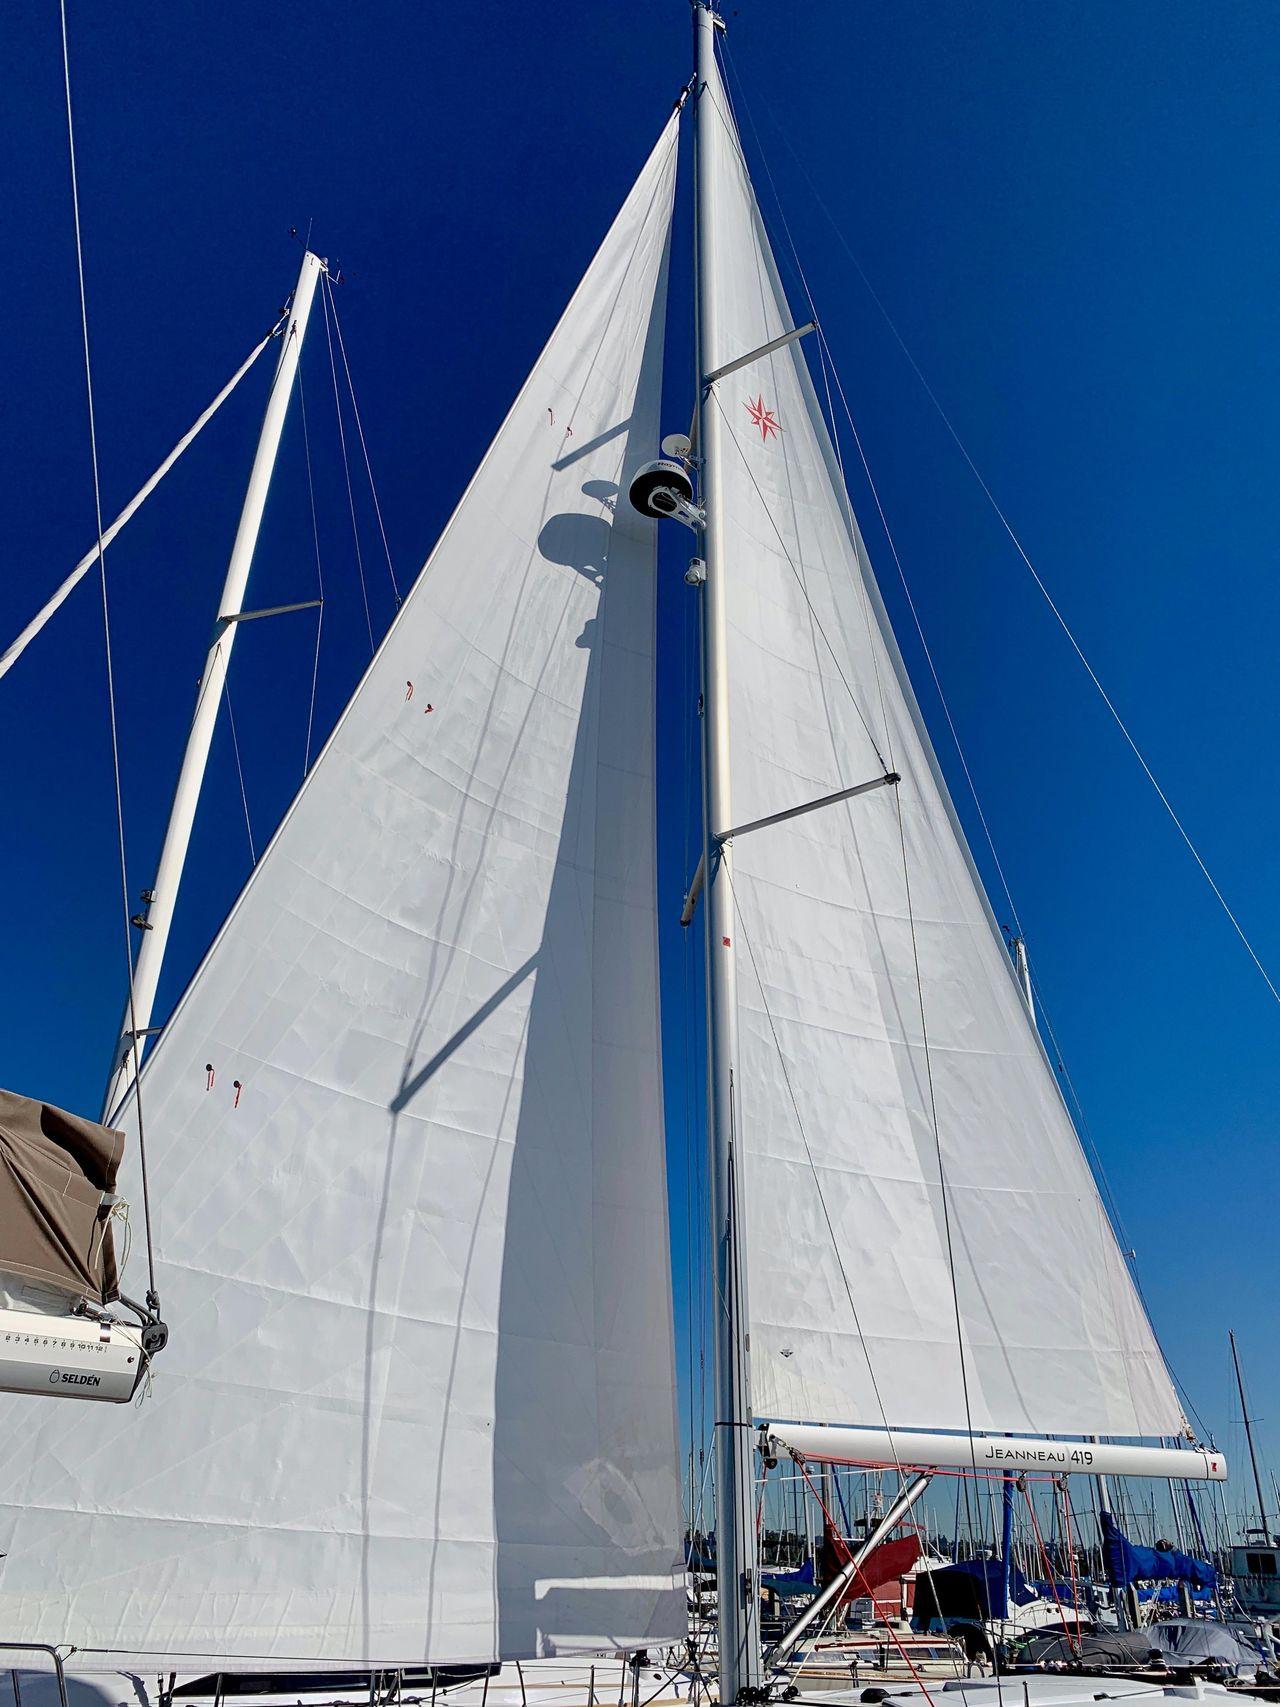 2019 Used Jeanneau 419 Sun Odyssey Racer and Cruiser